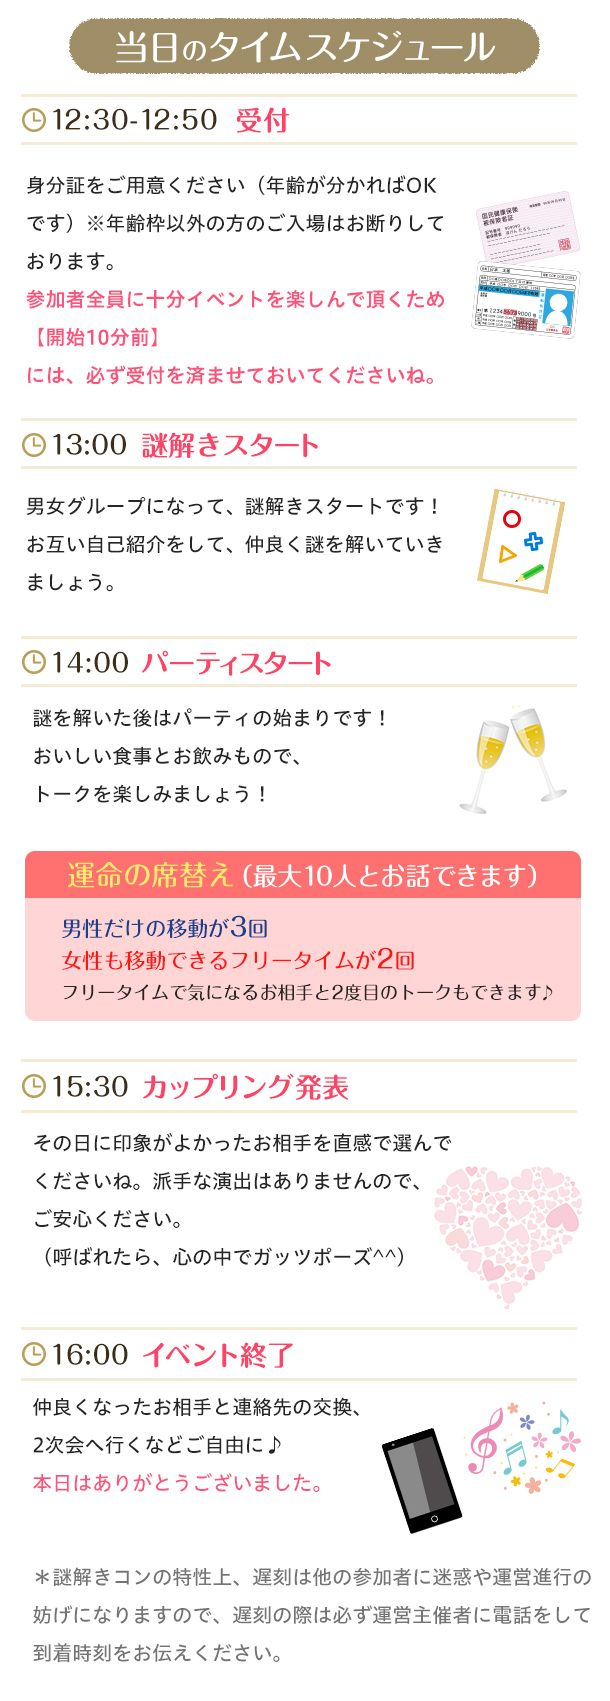 timeschedule (1)